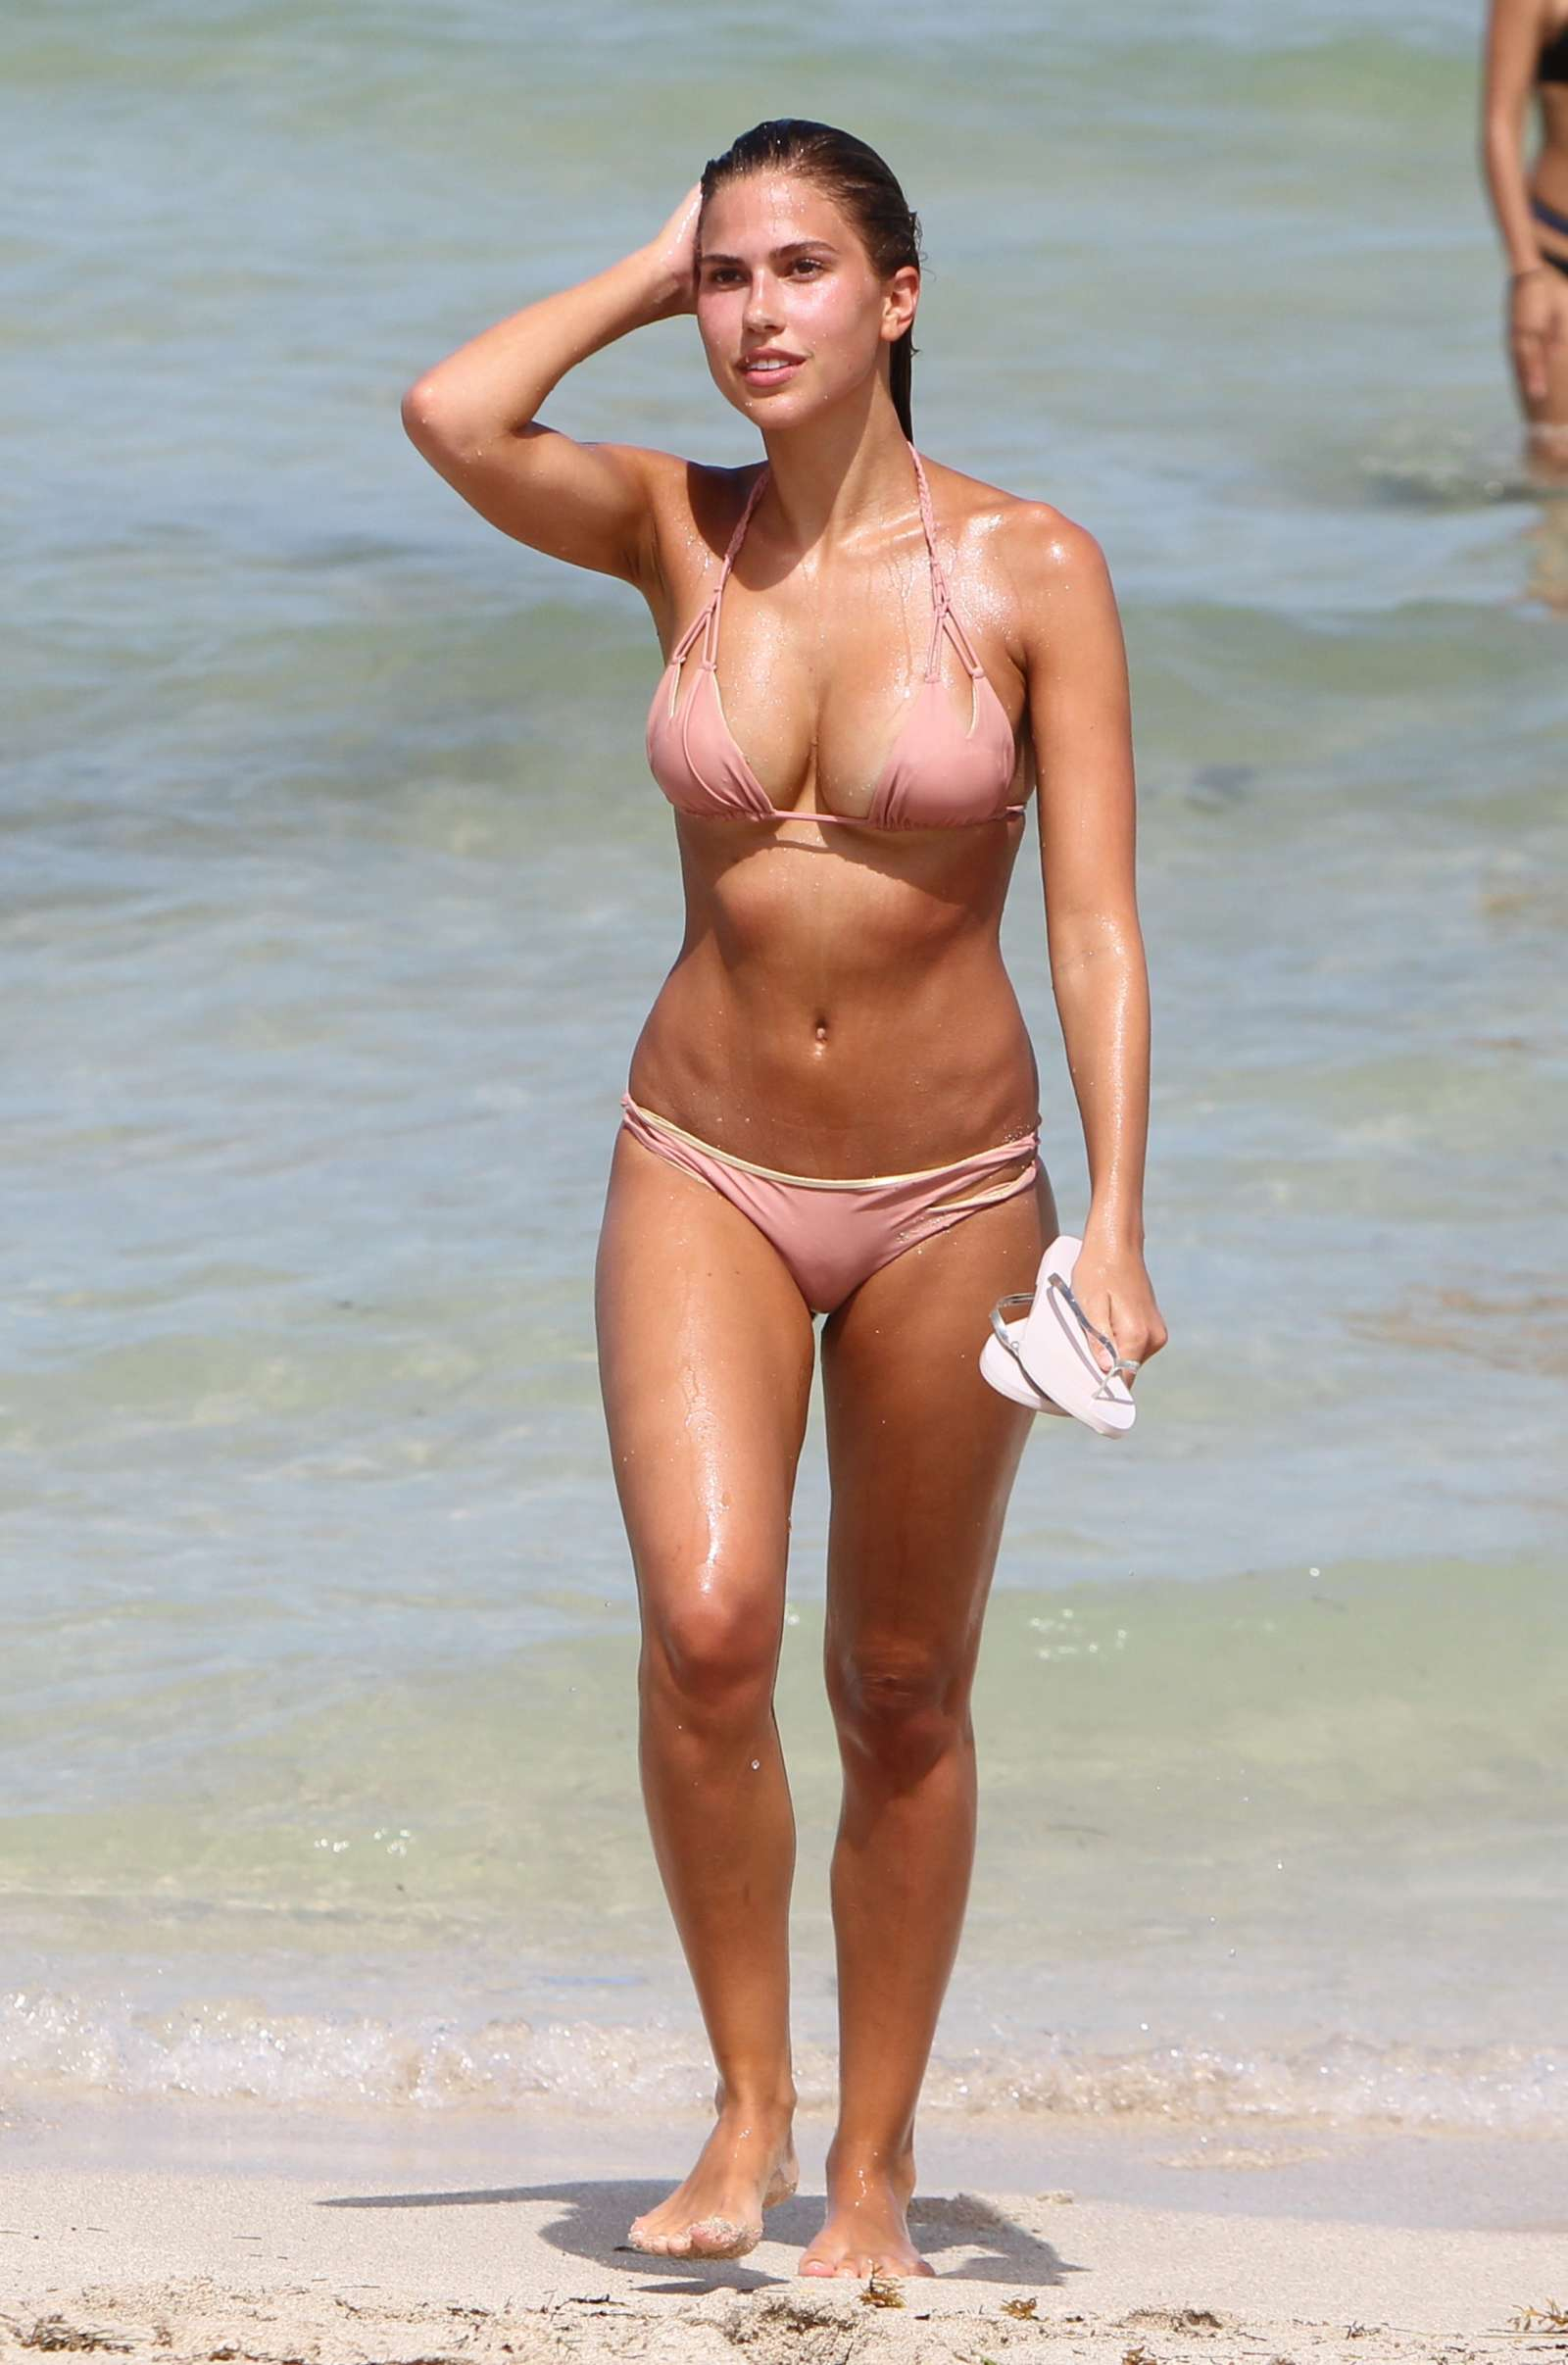 Kara Del Toro In Bikini On The Photoshoot 03 Gotceleb